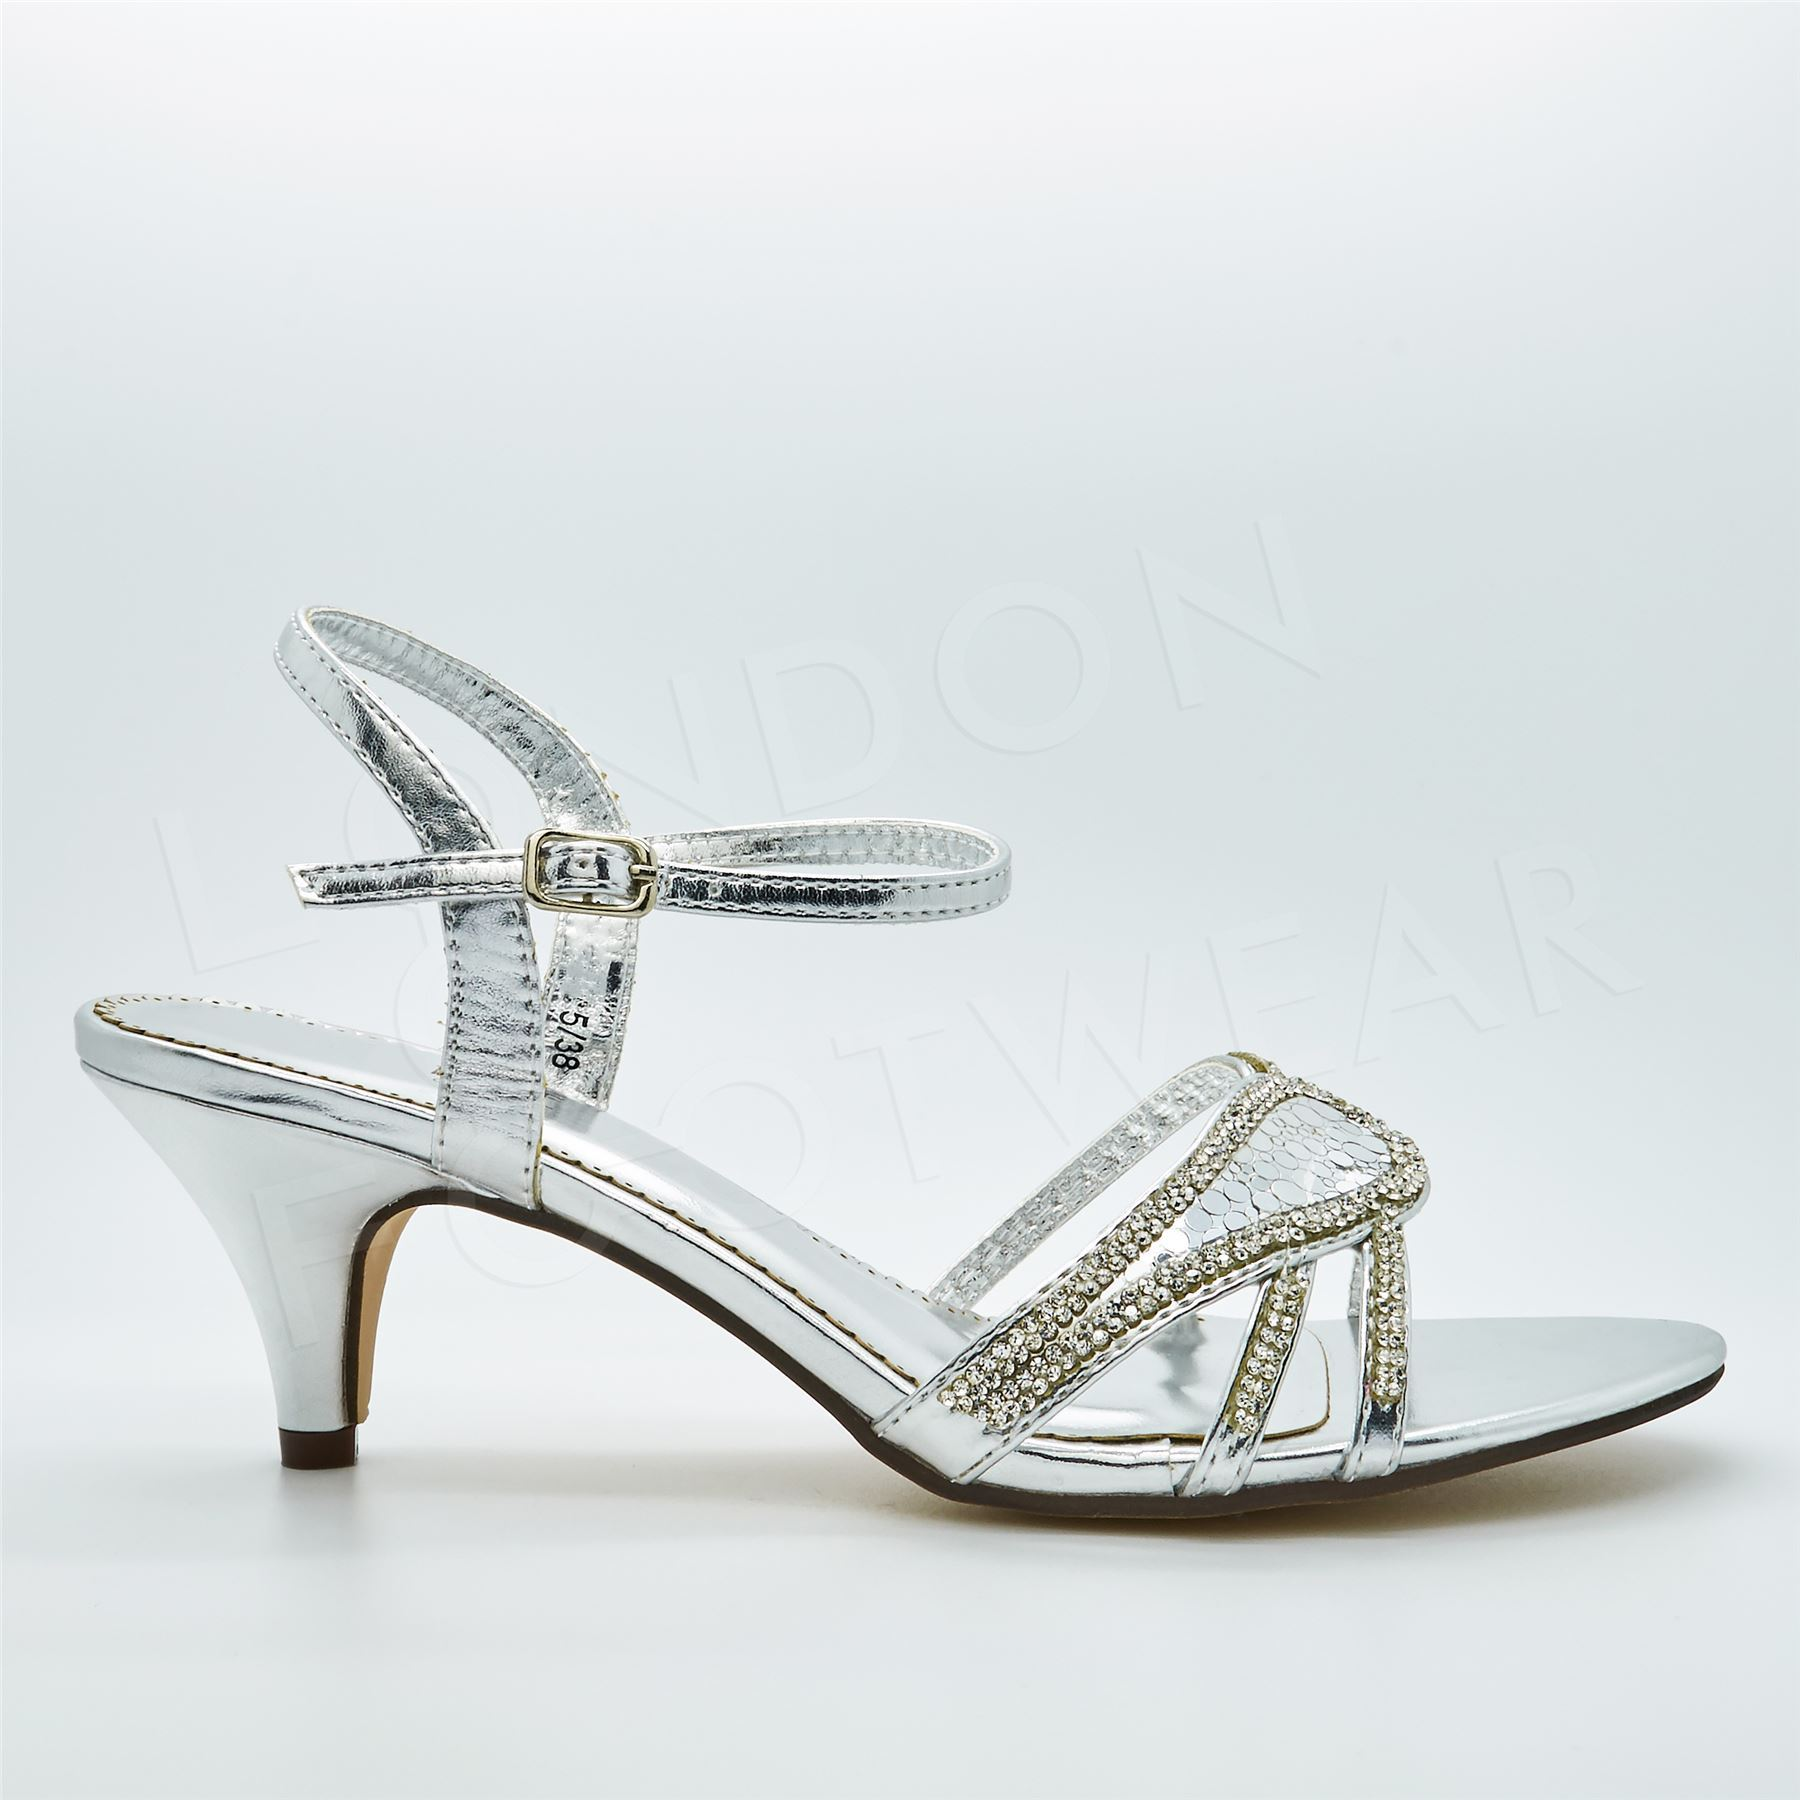 42c92ebf9e0 Womens Diamante Low Kitten HEELS Strappy Sandals Ladies Bridal ...